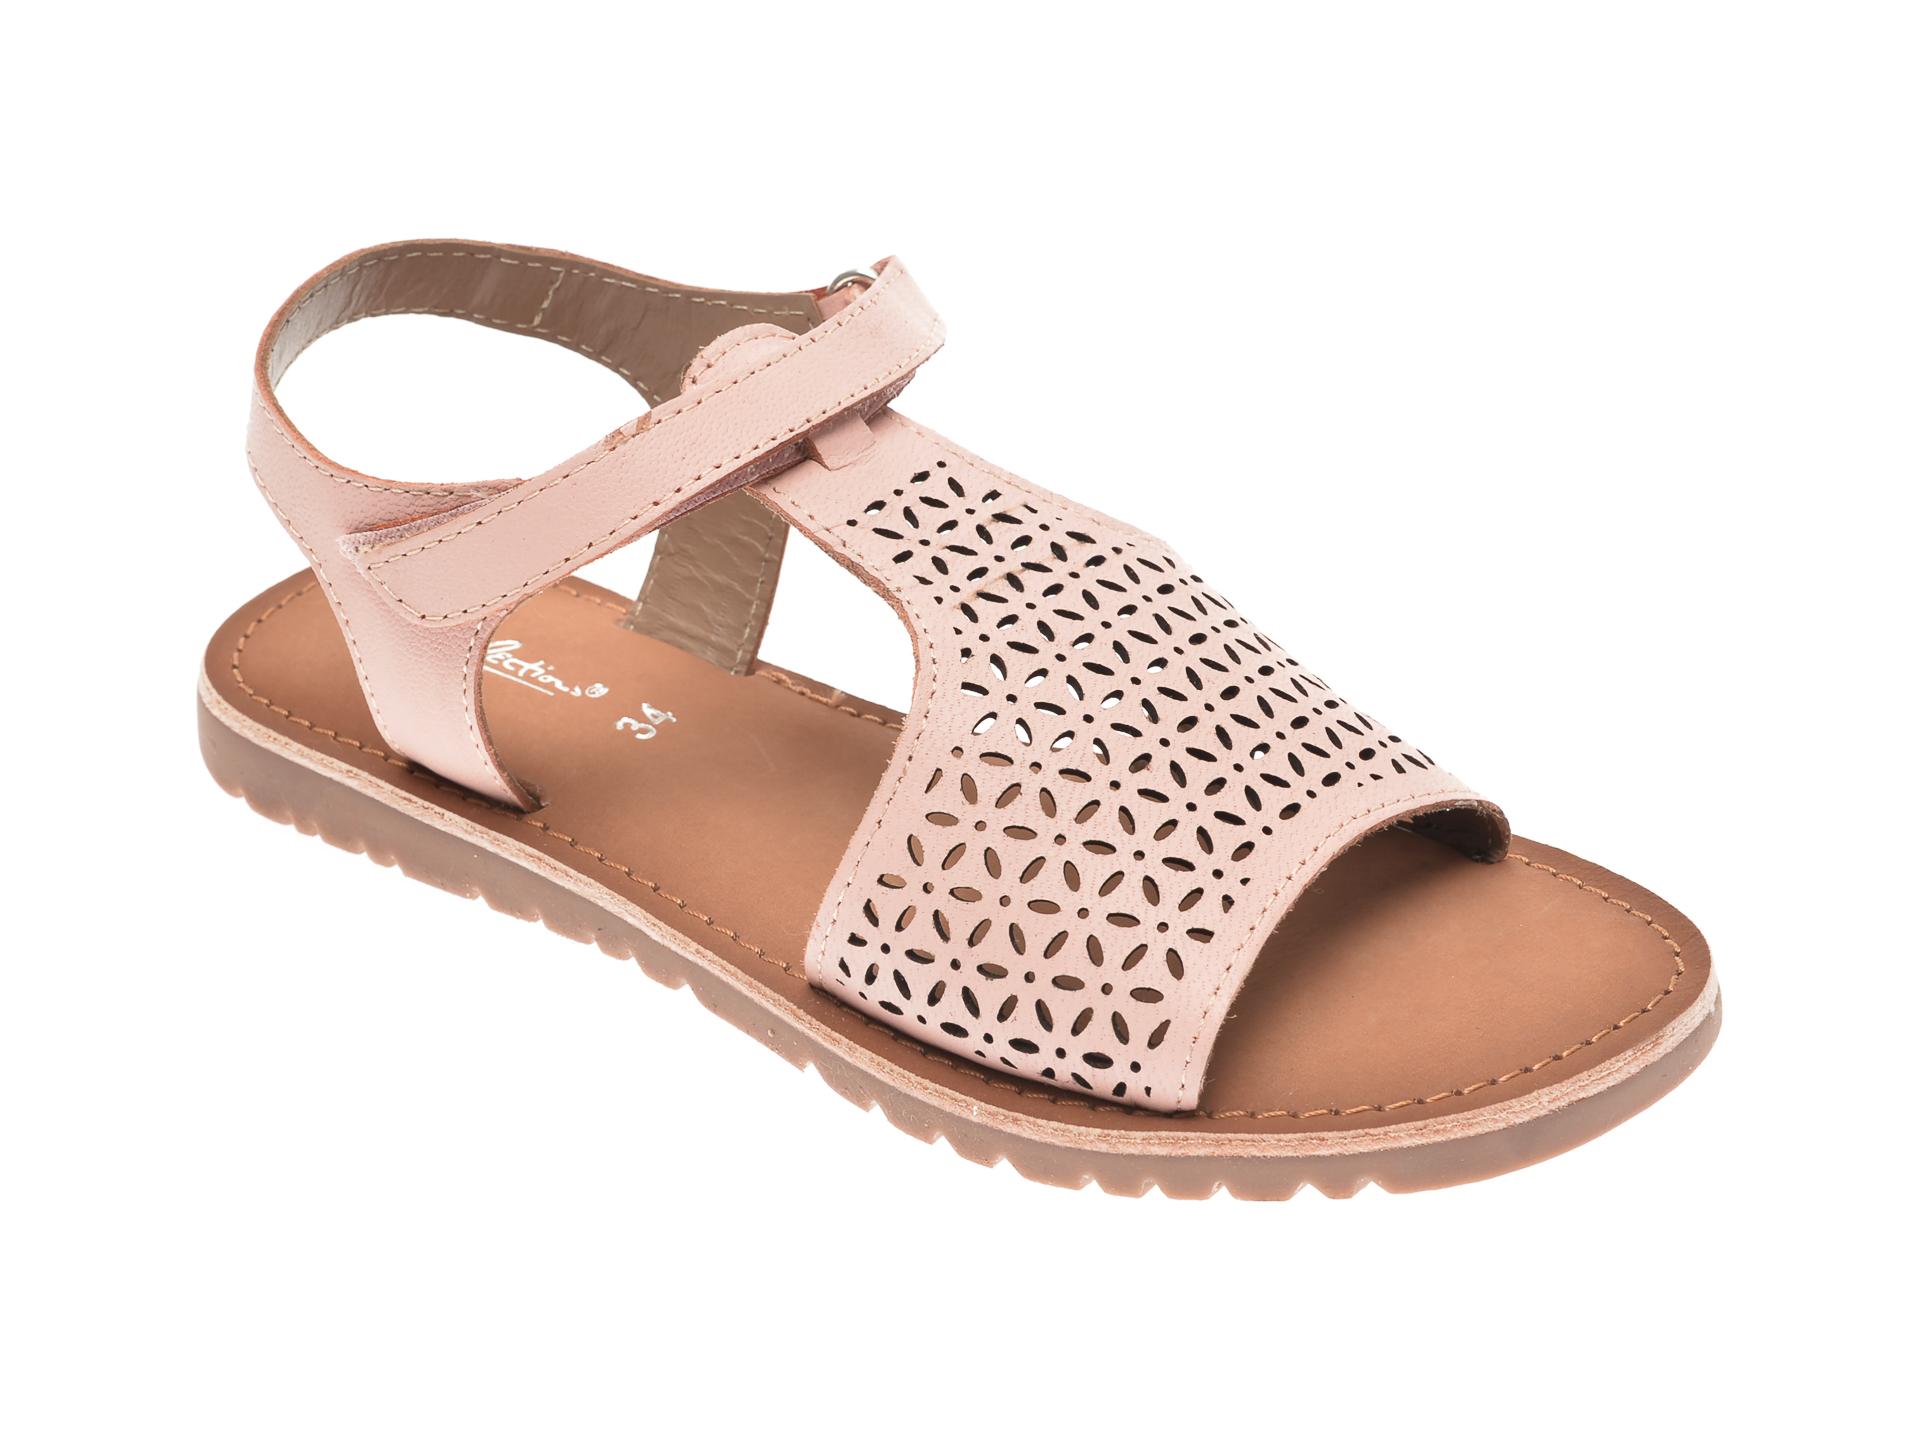 Sandale SELECTION KIDS roz, SH22, din piele naturala